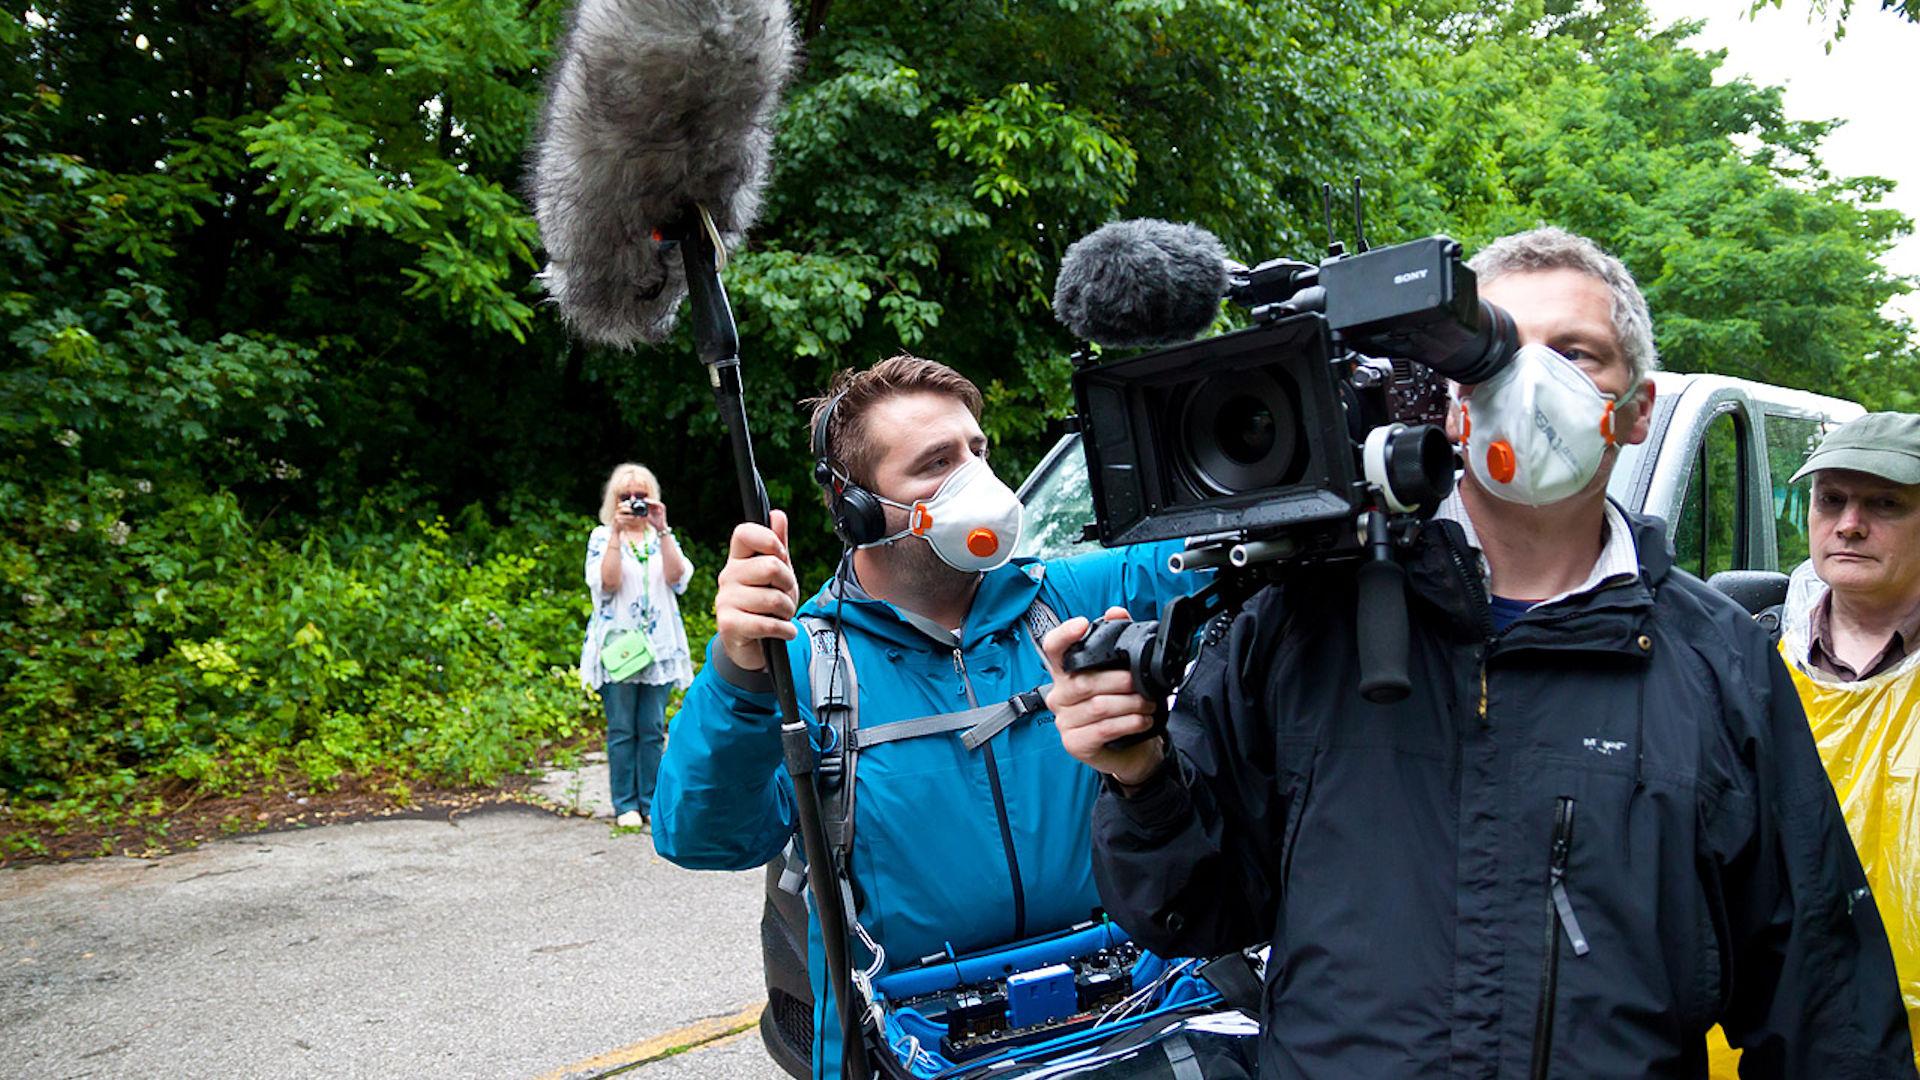 Filming a documentary in Croatia